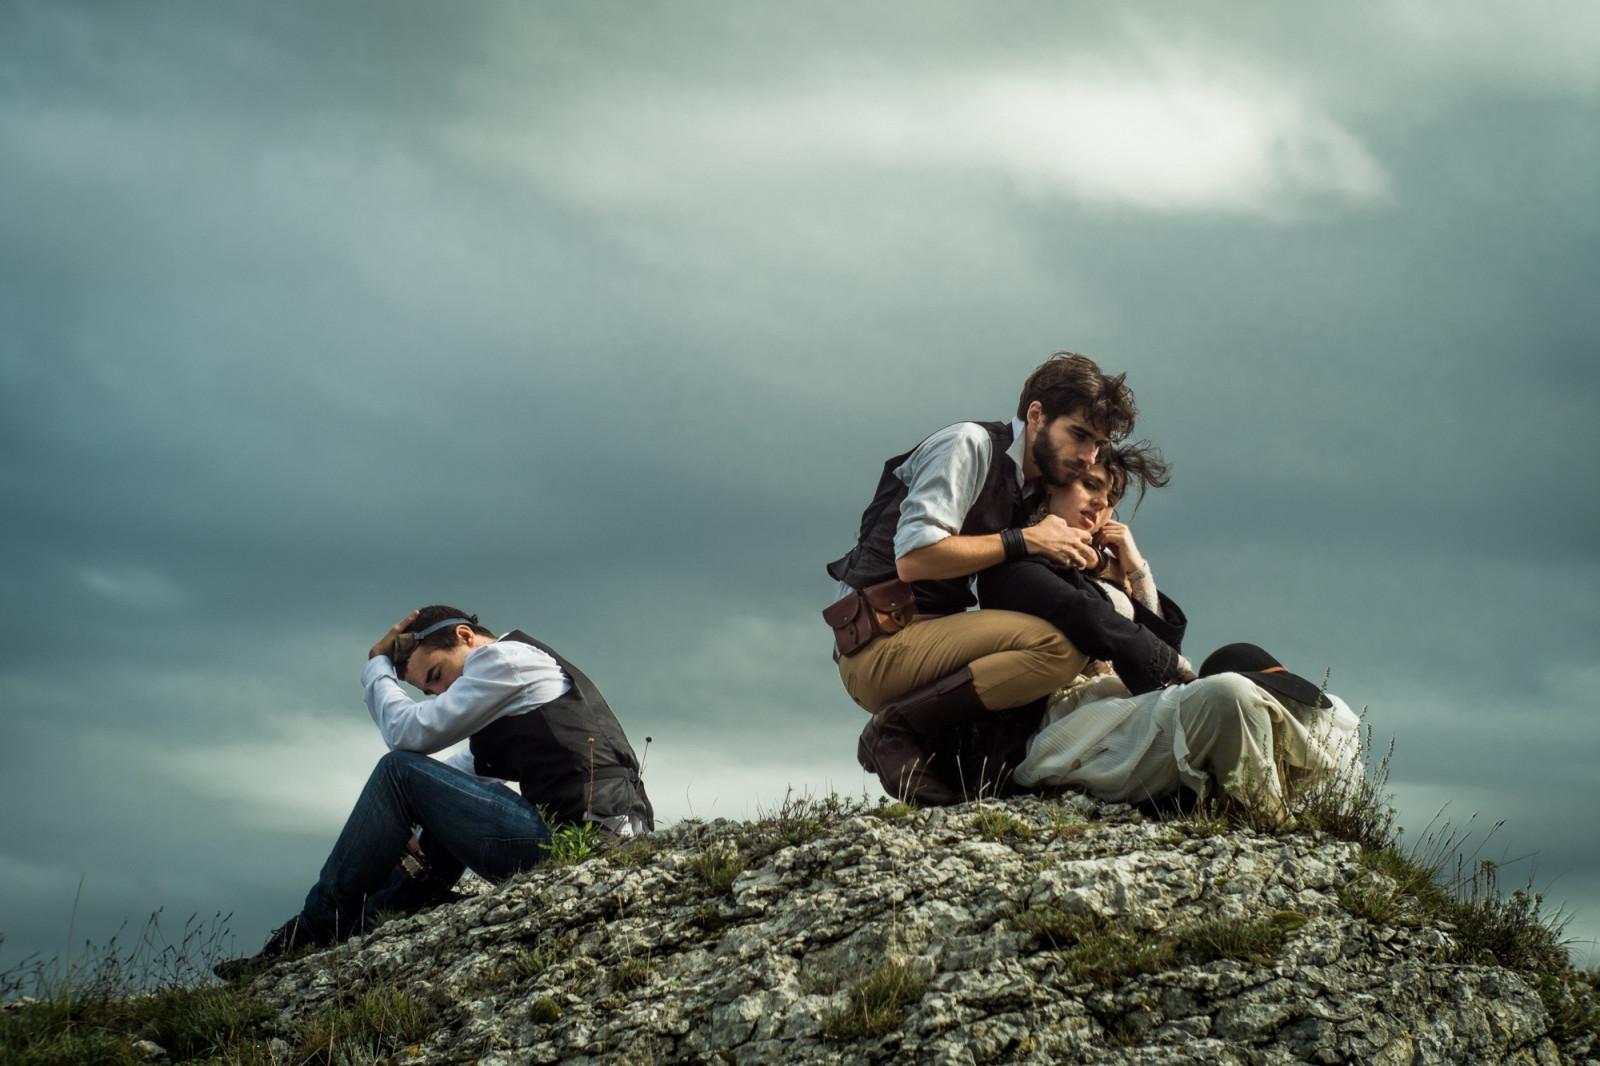 Wallpaper : Men, Women, Love, Emotion, Walking, Mountain